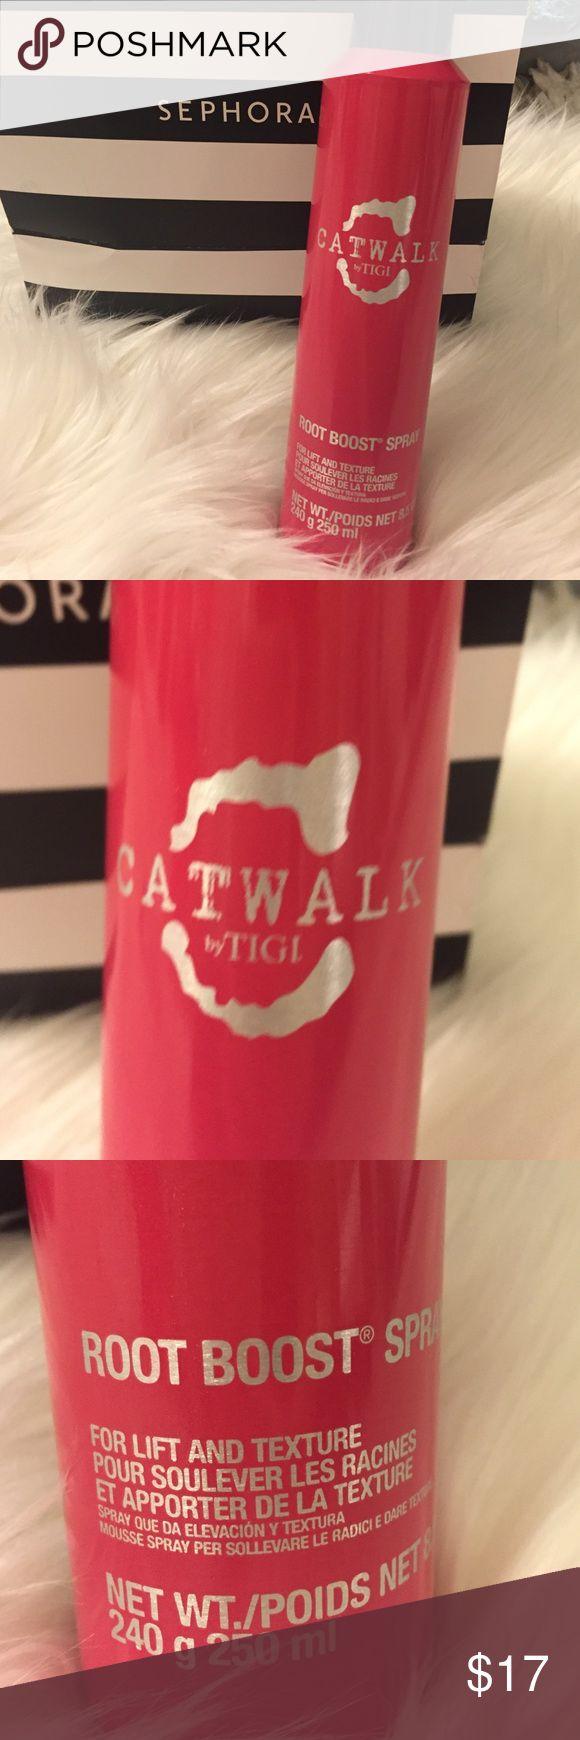 New Catwalk TIGI Root Boost Spray New Catwalk by TIGI Root Boost Spray for lift &  texture. Catwalk by TIGI Makeup